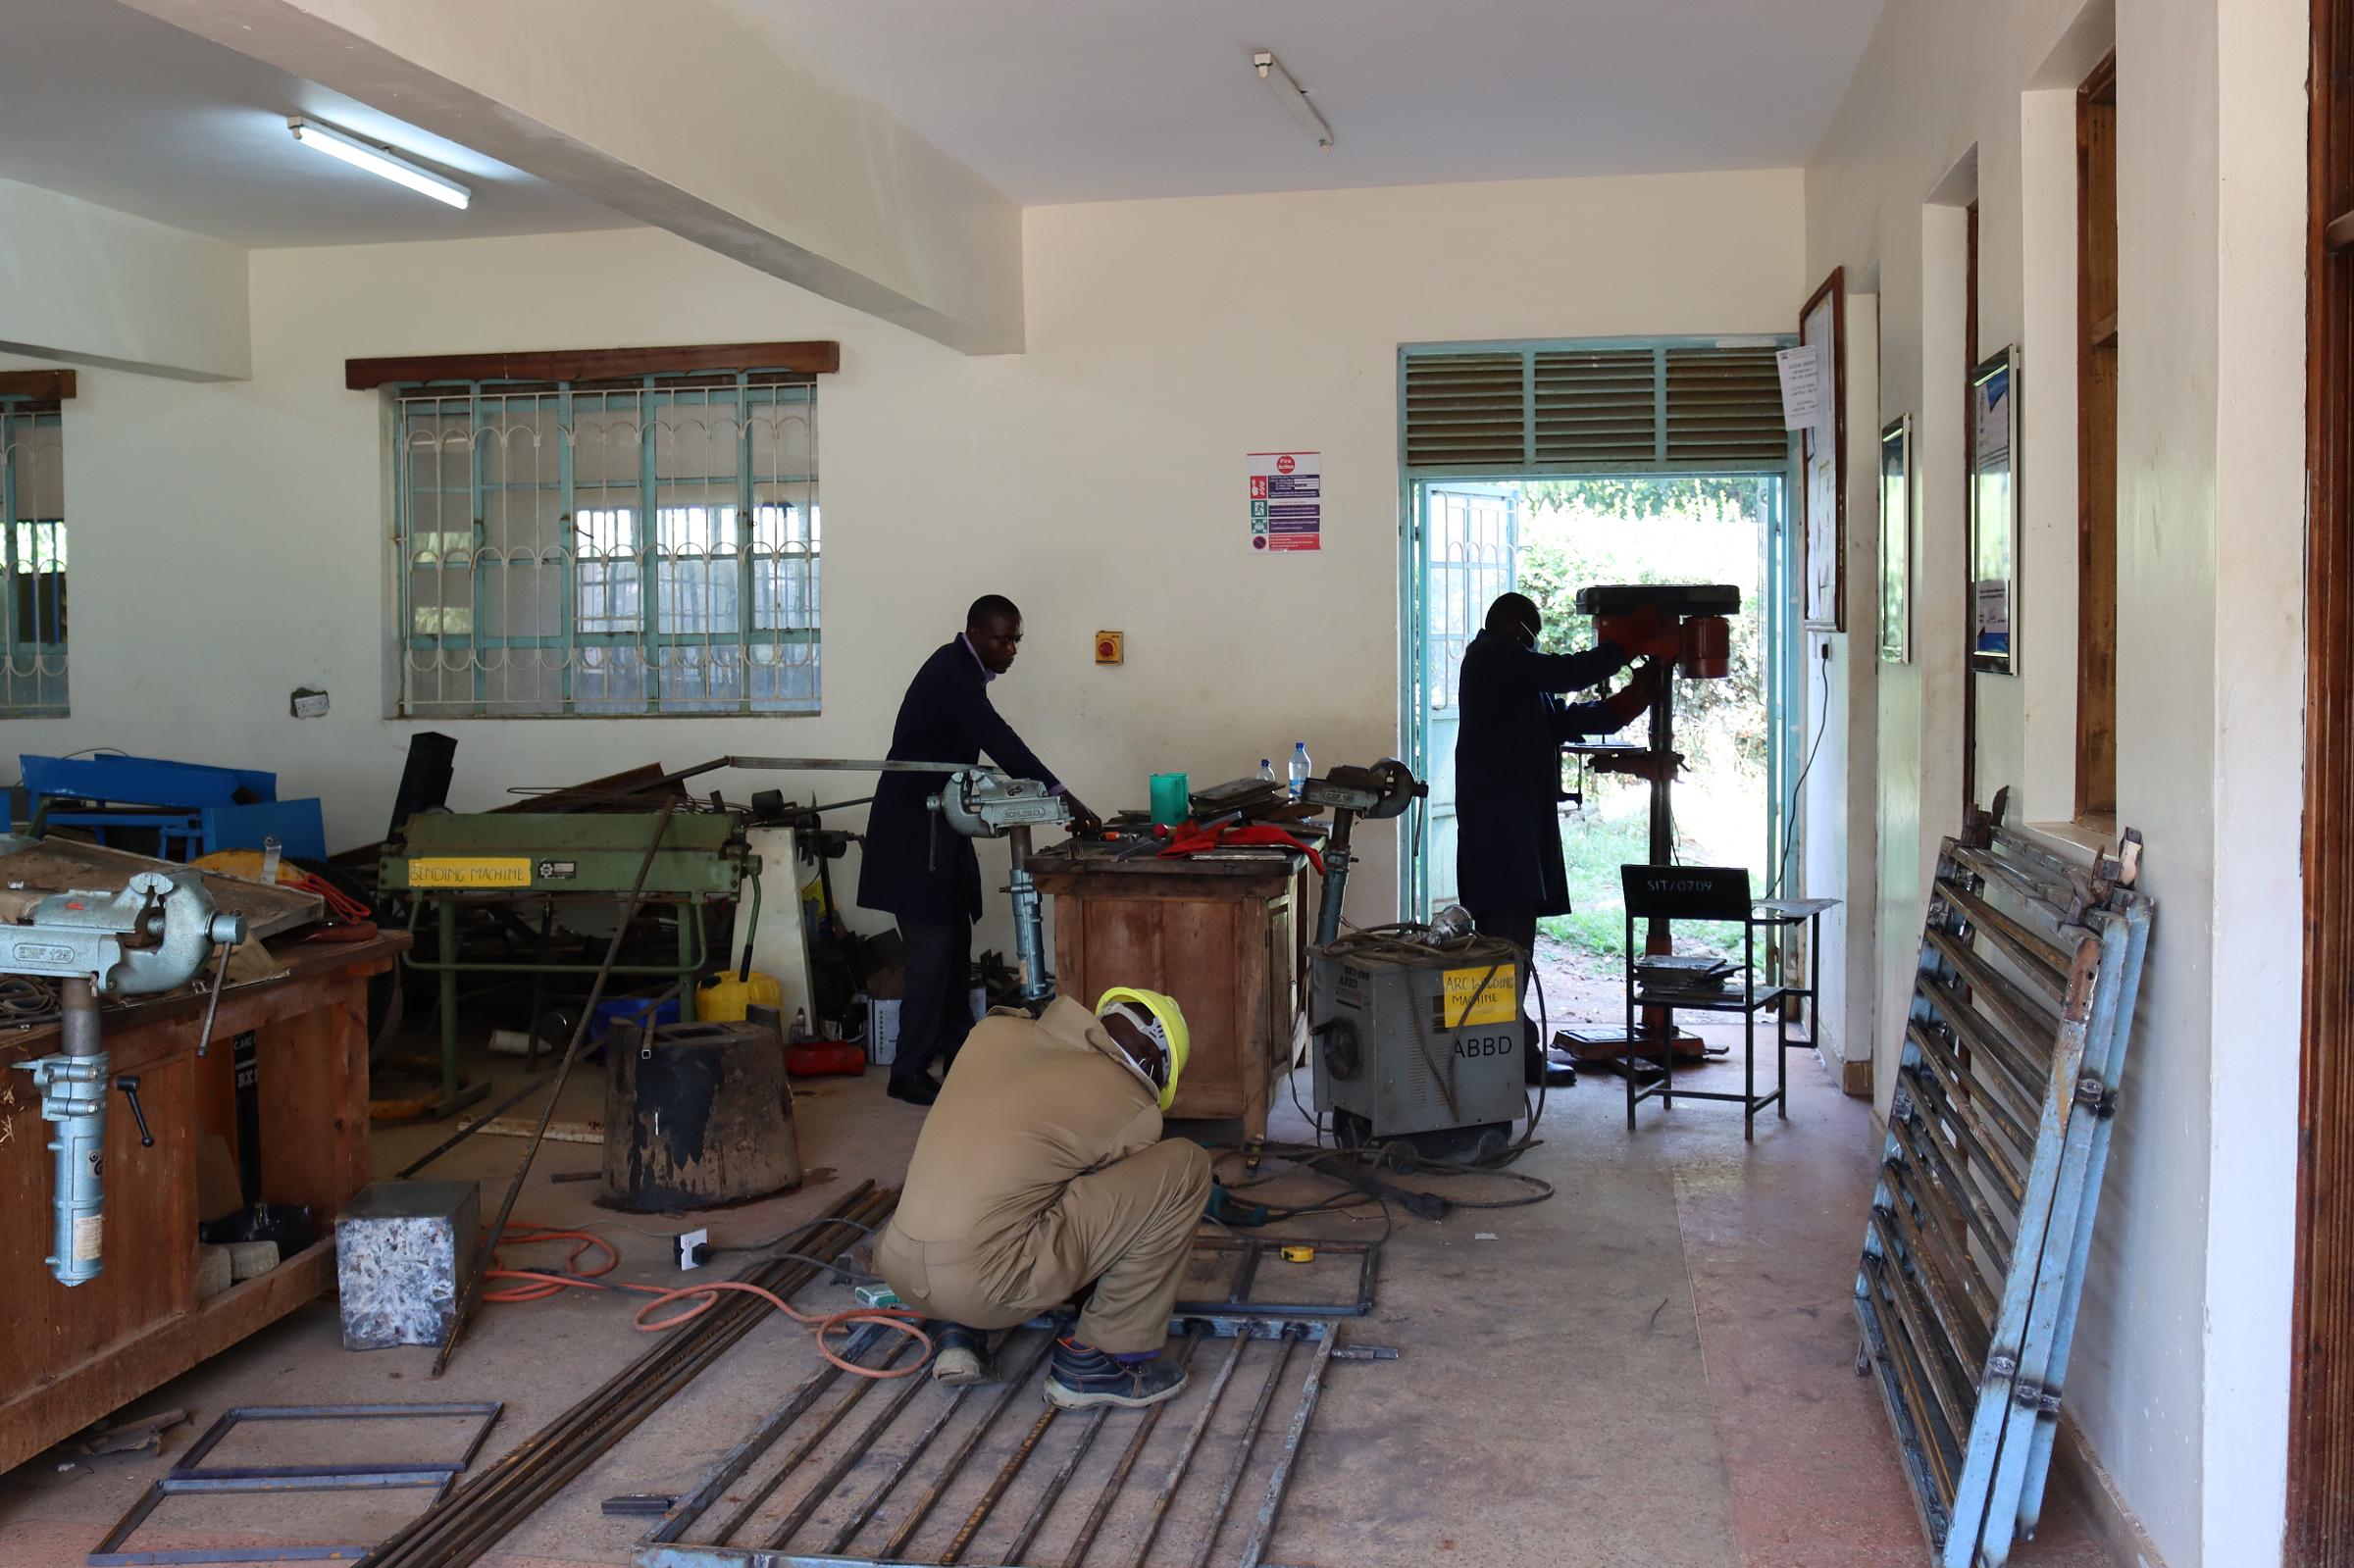 Technicians in a Workshop